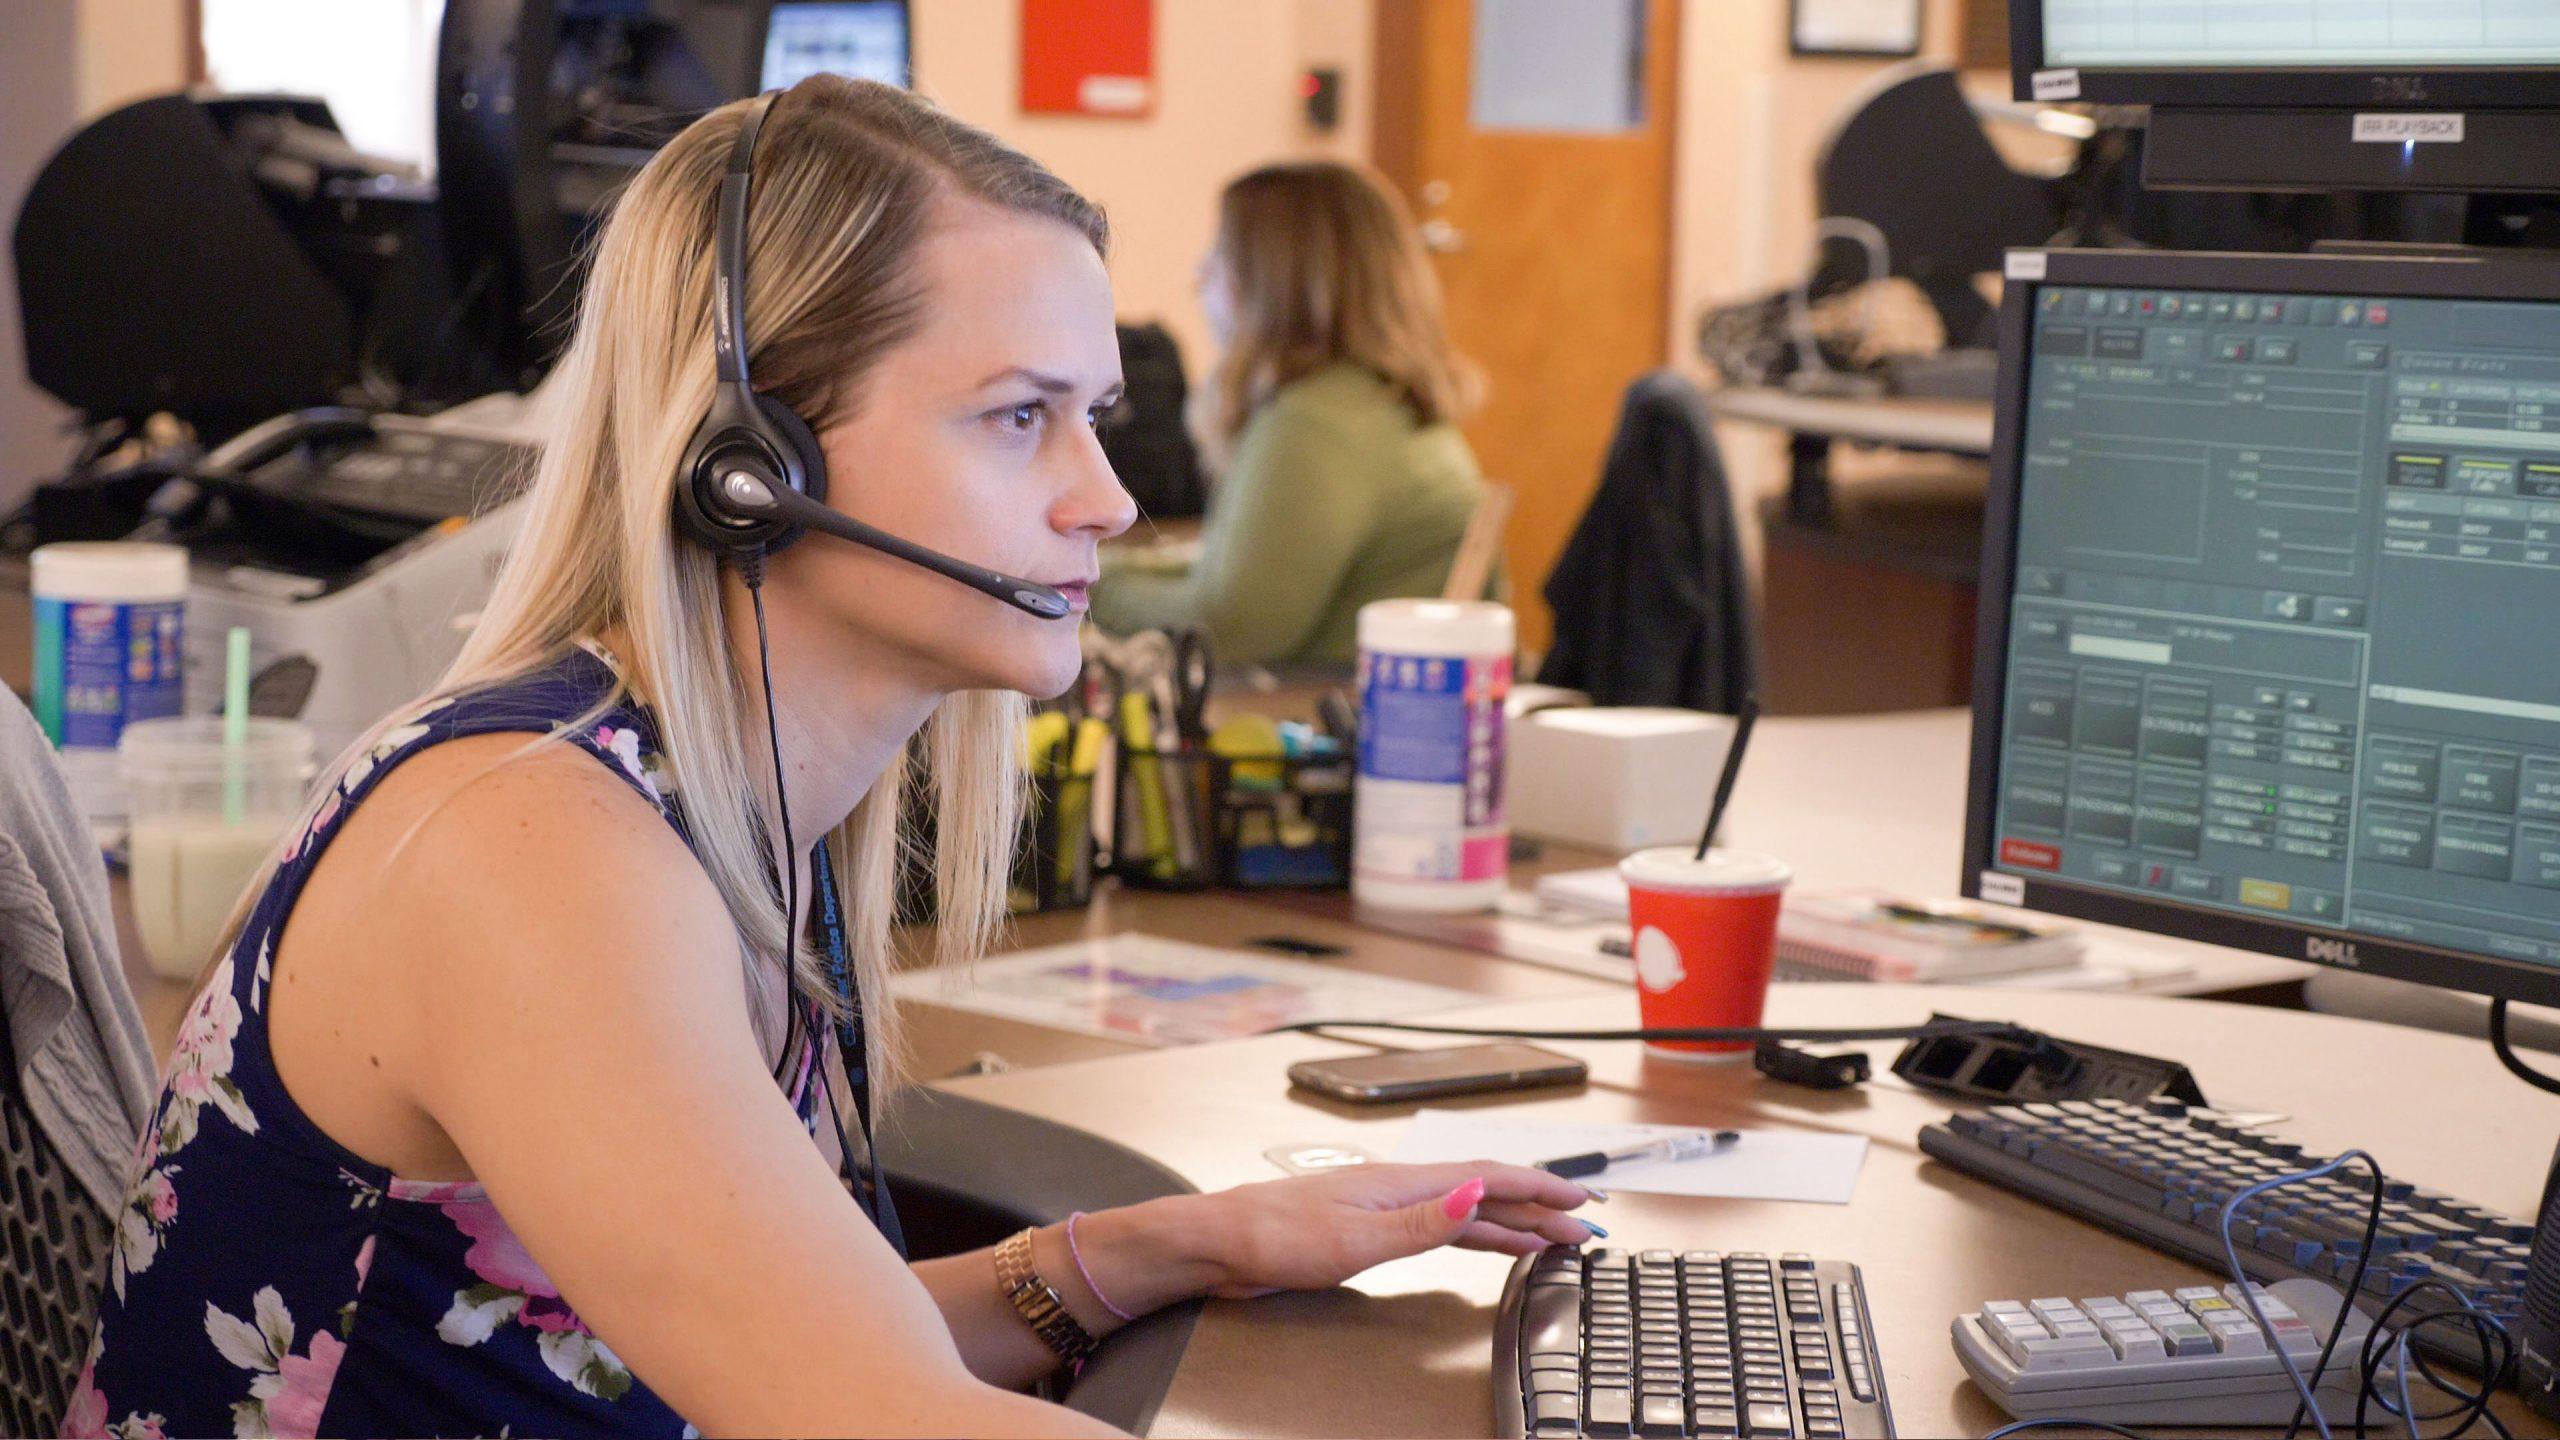 A 911 telecommunicator taking emergency calls